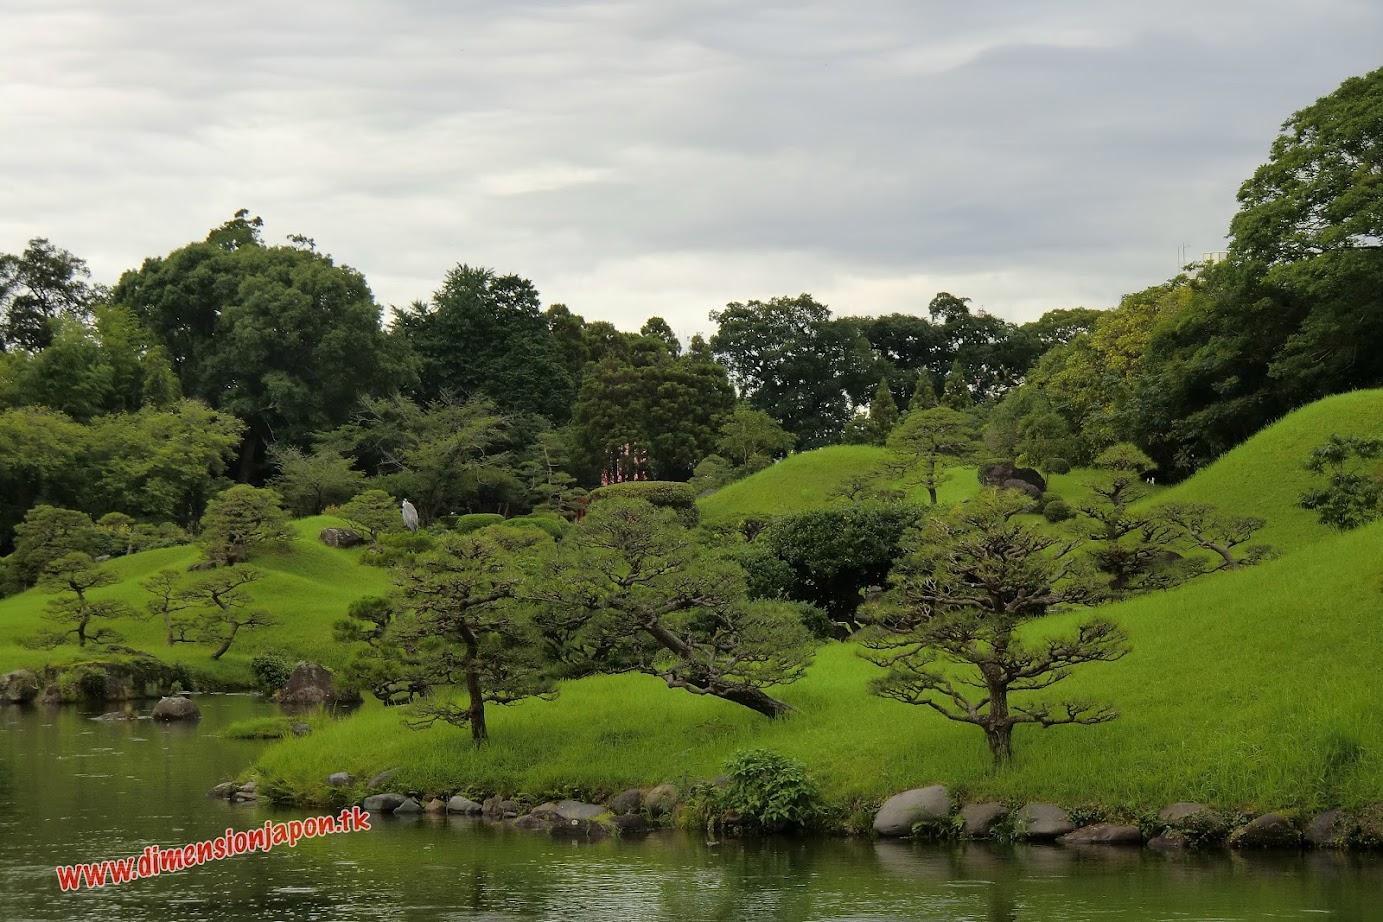 CIMG1529 Jardines Suizenji (Kumamoto) 15-07-2010